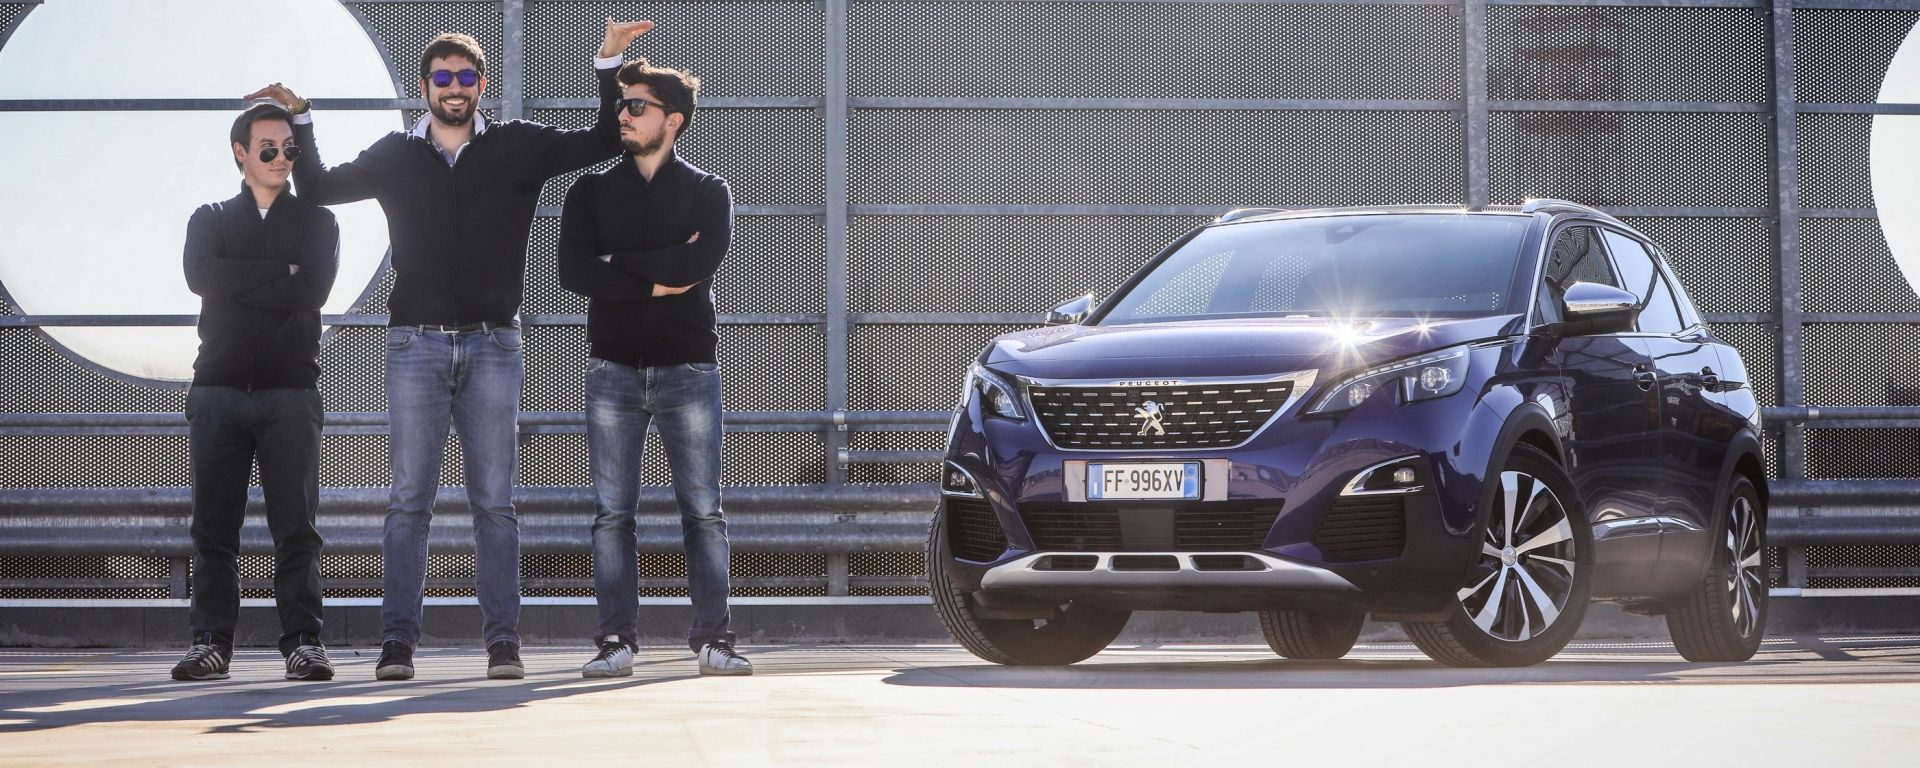 Peugeot 3008: l'i-Cockpit vissuto da tre altezze diverse